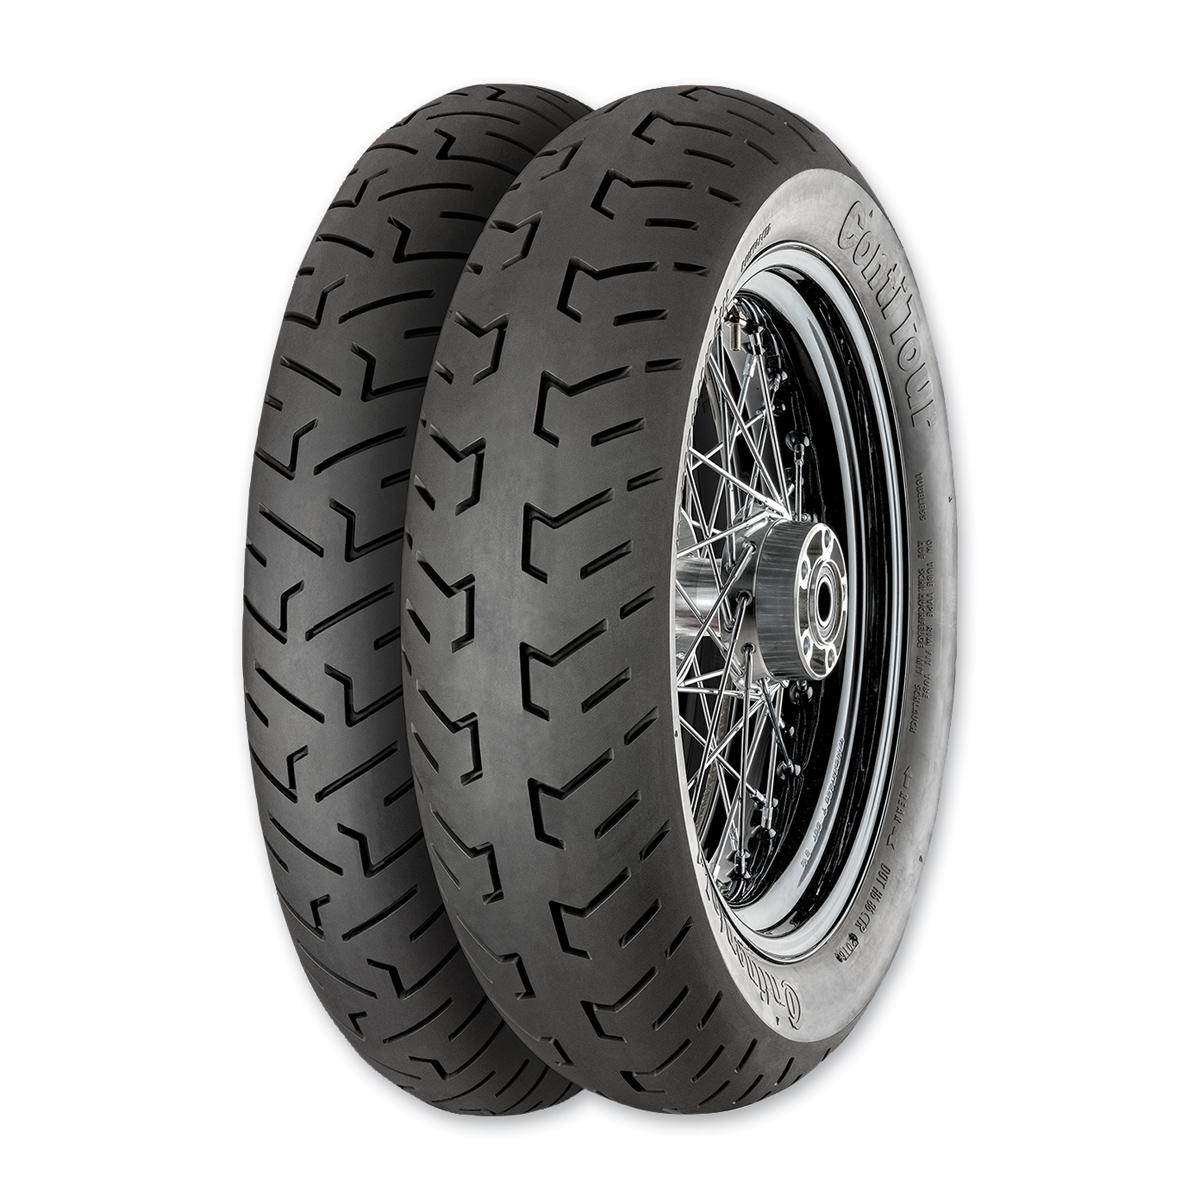 Continental Tour 130/90-16 Rear Tire